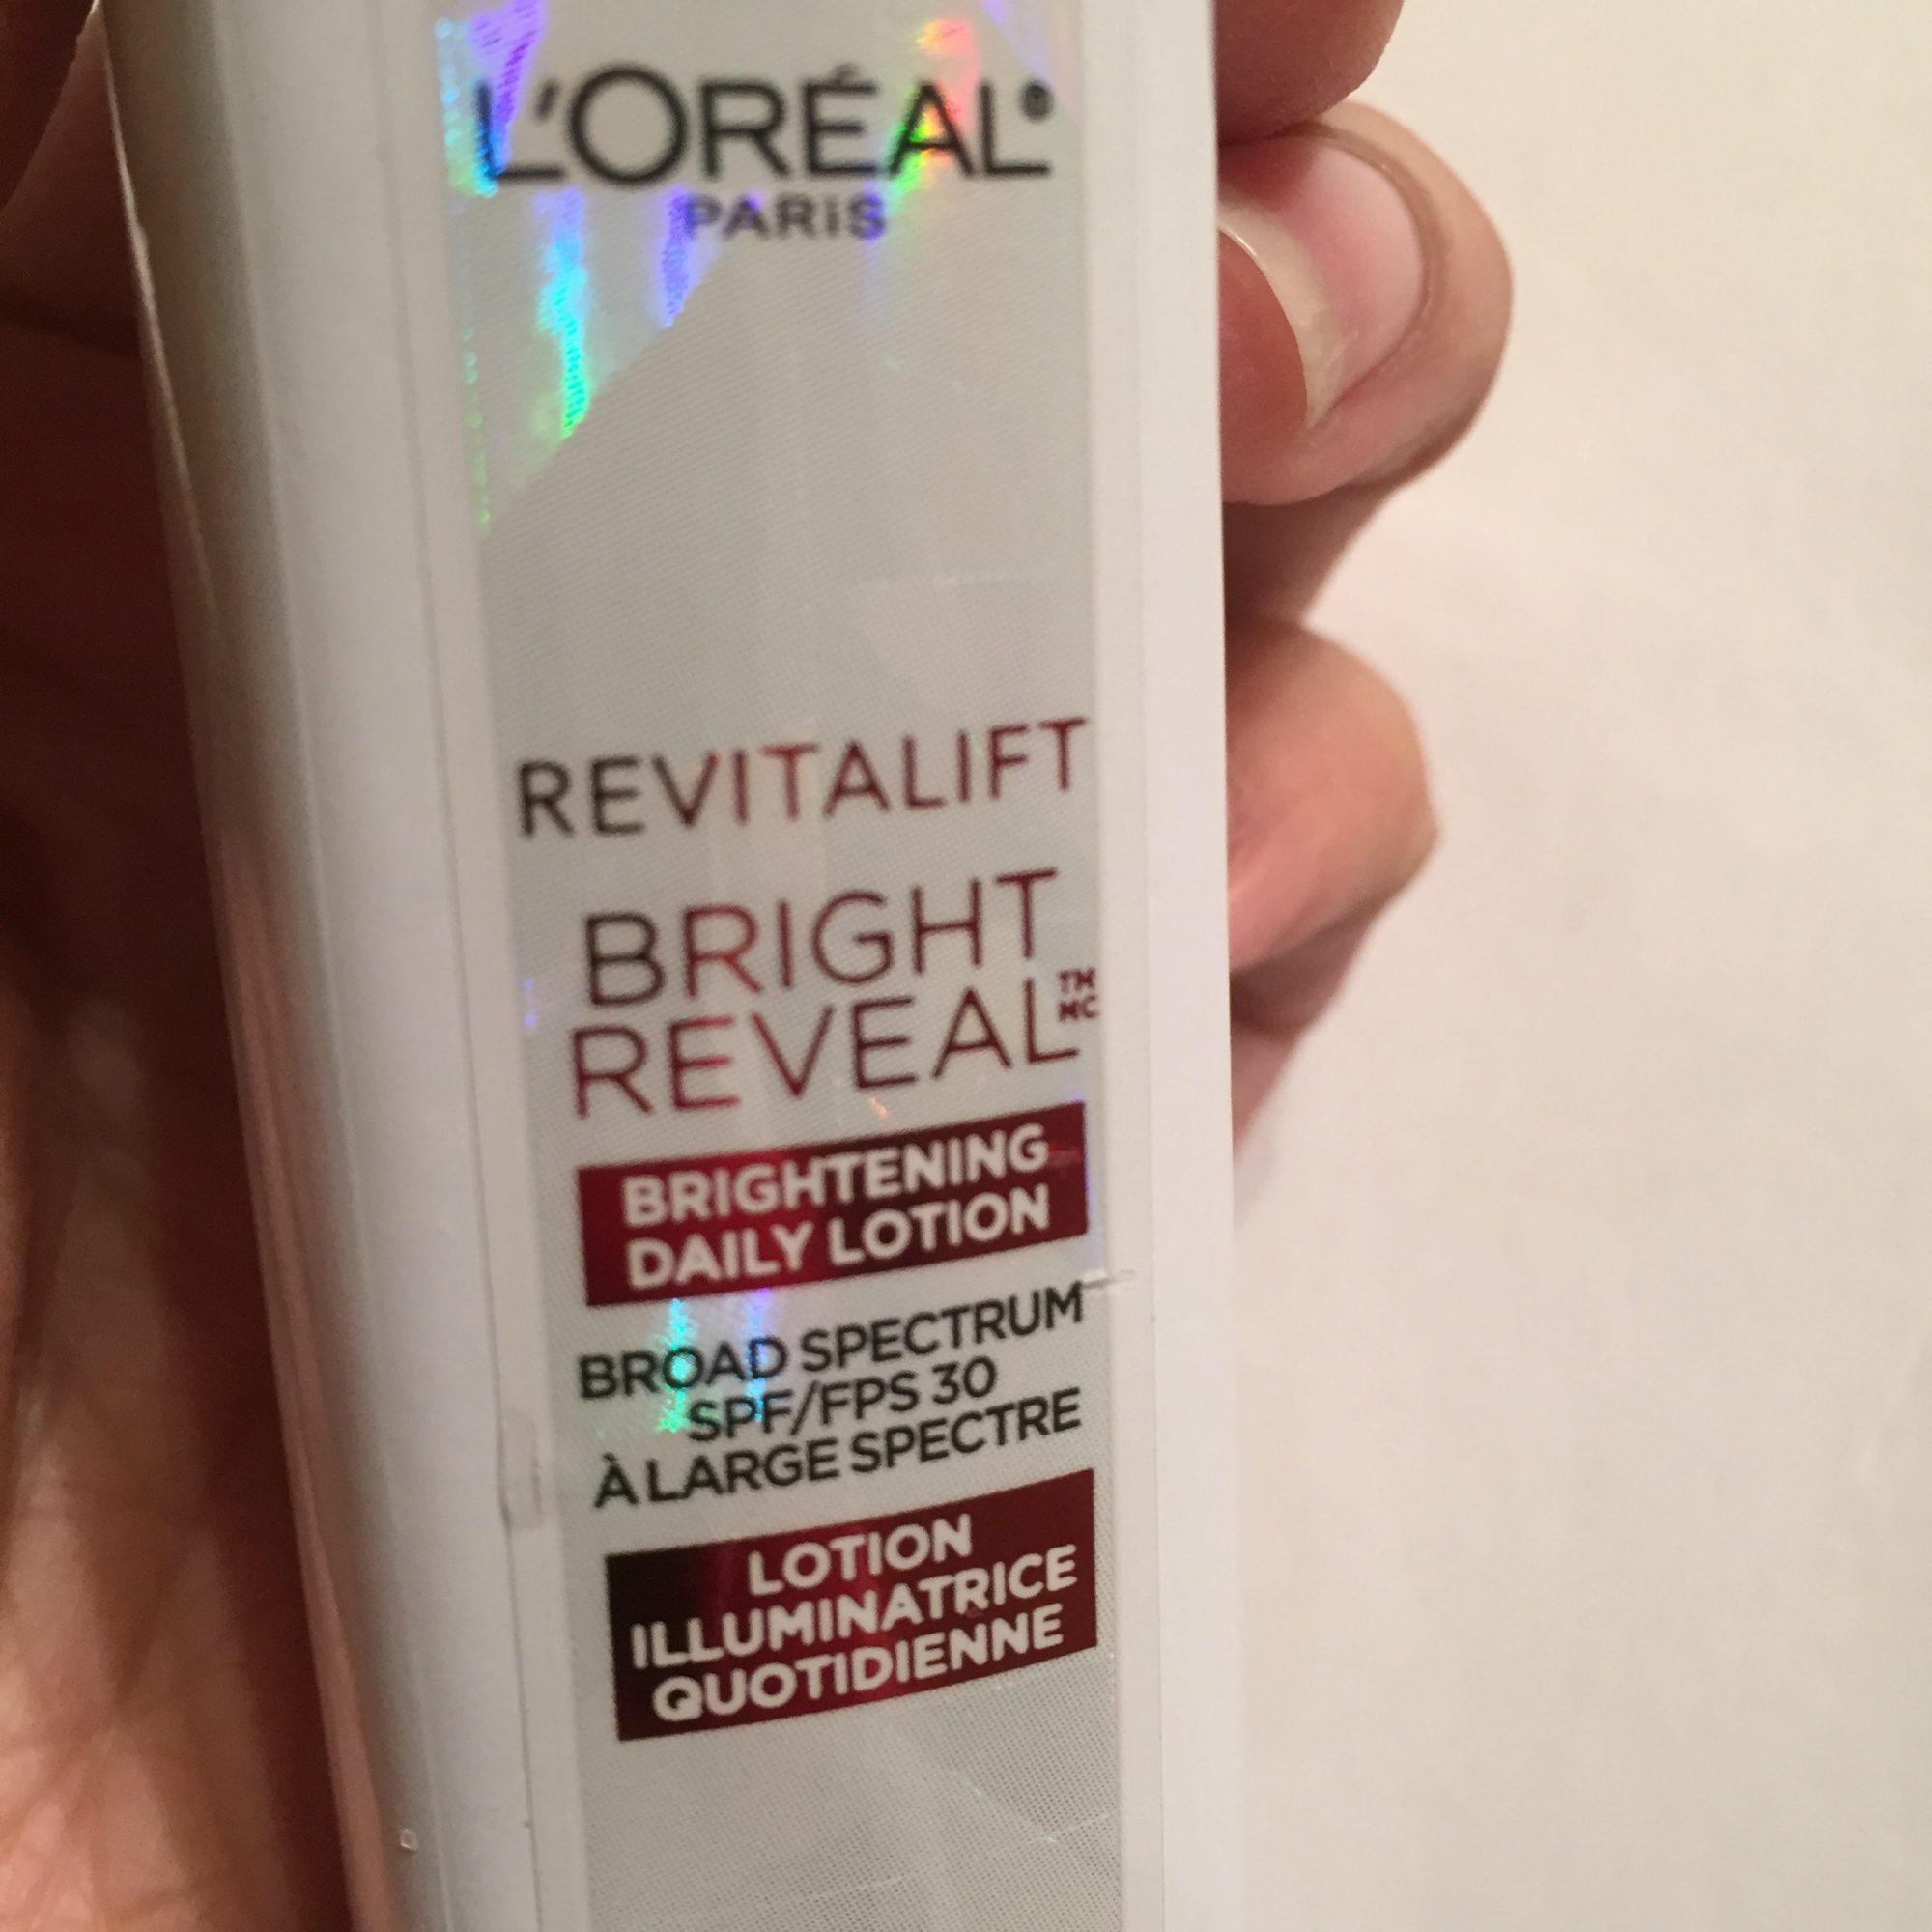 spf 30 bright reveal